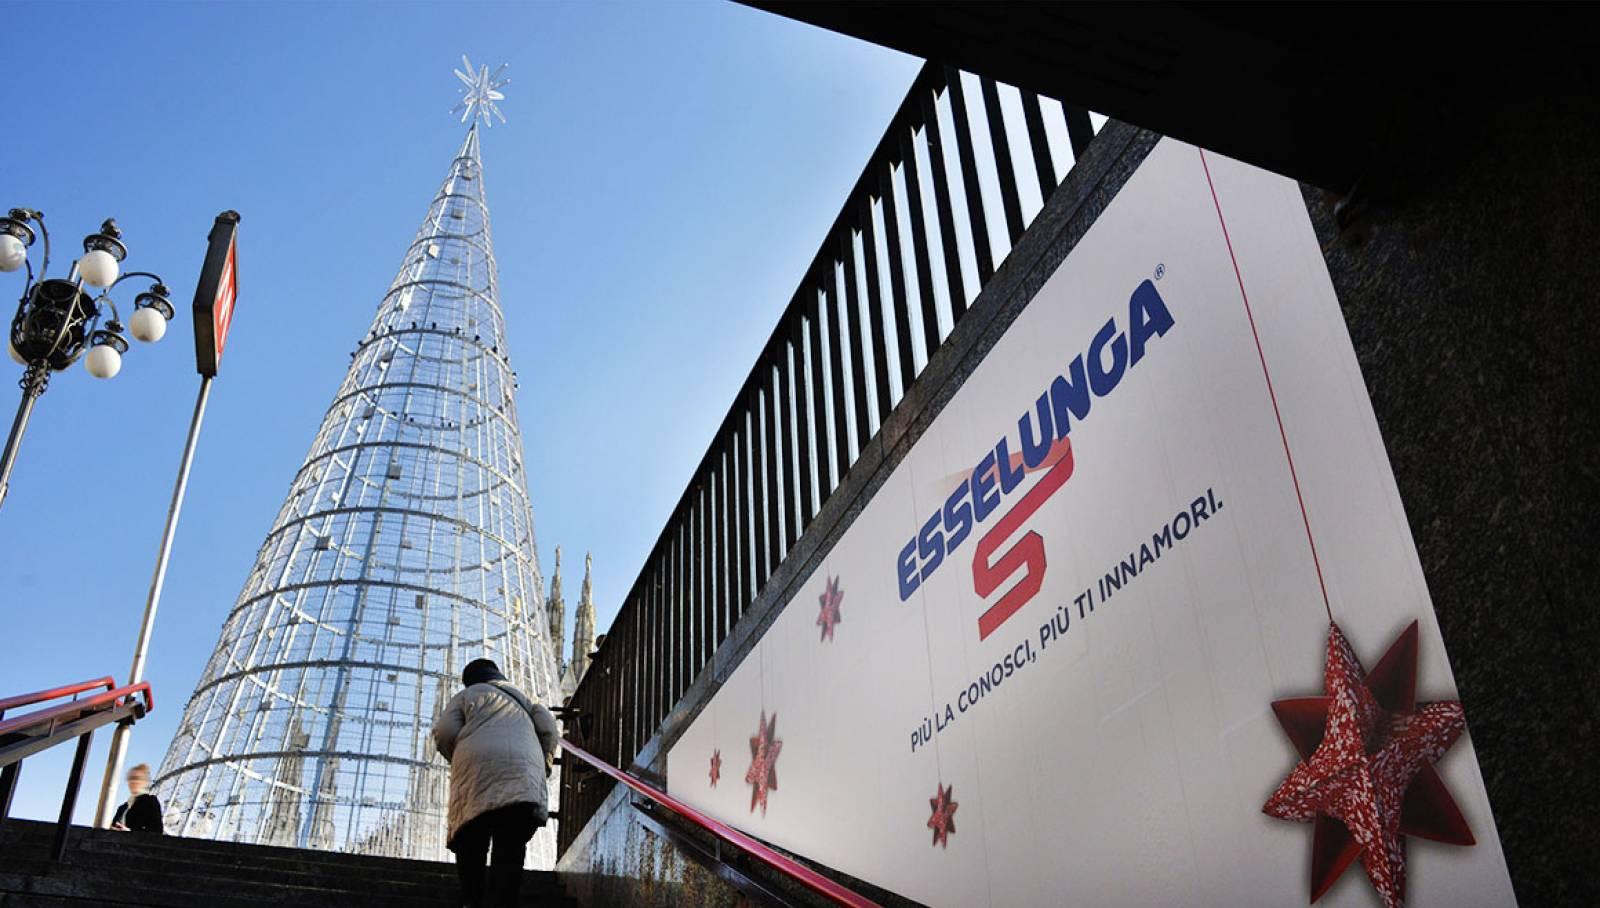 IGPDecaux albero di Natale per Esselunga Milano Natale 2019